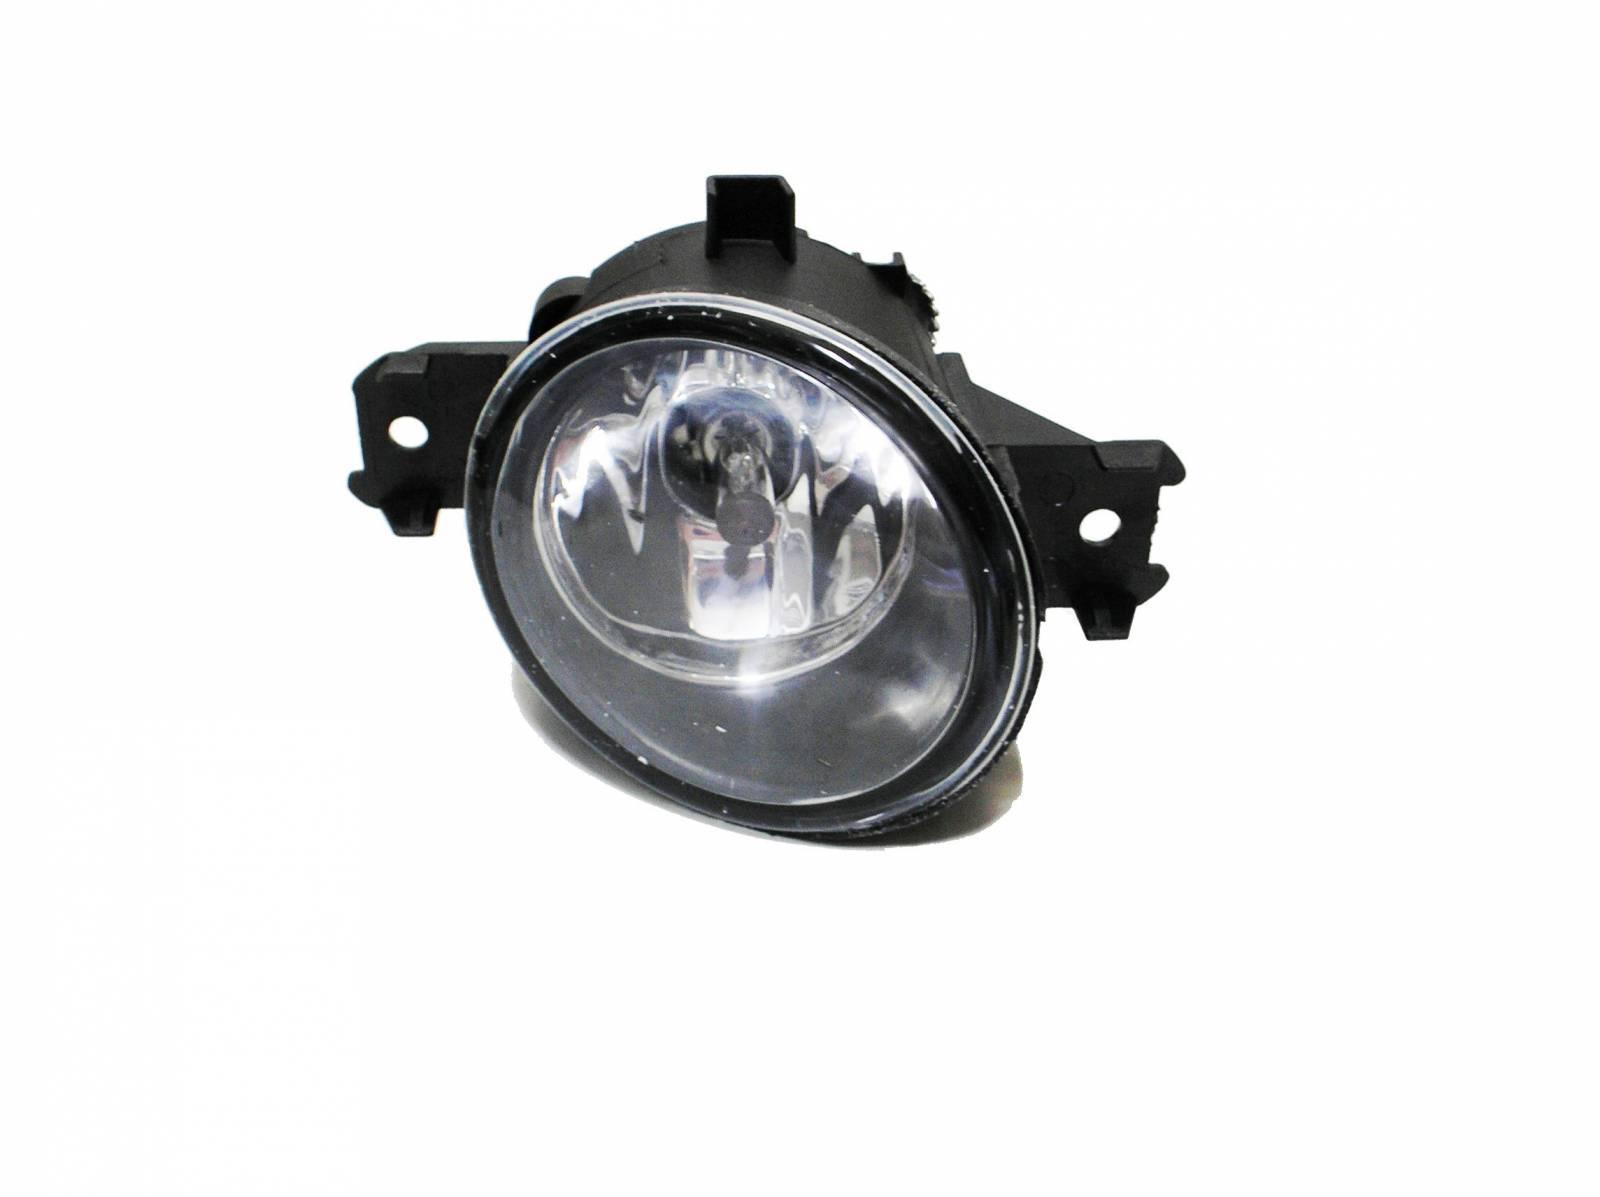 FAROL AUXILIAR MILHA LIVINA 09 10 11 12 13 14 15 16 LD LAMPA - Sul Acessorios